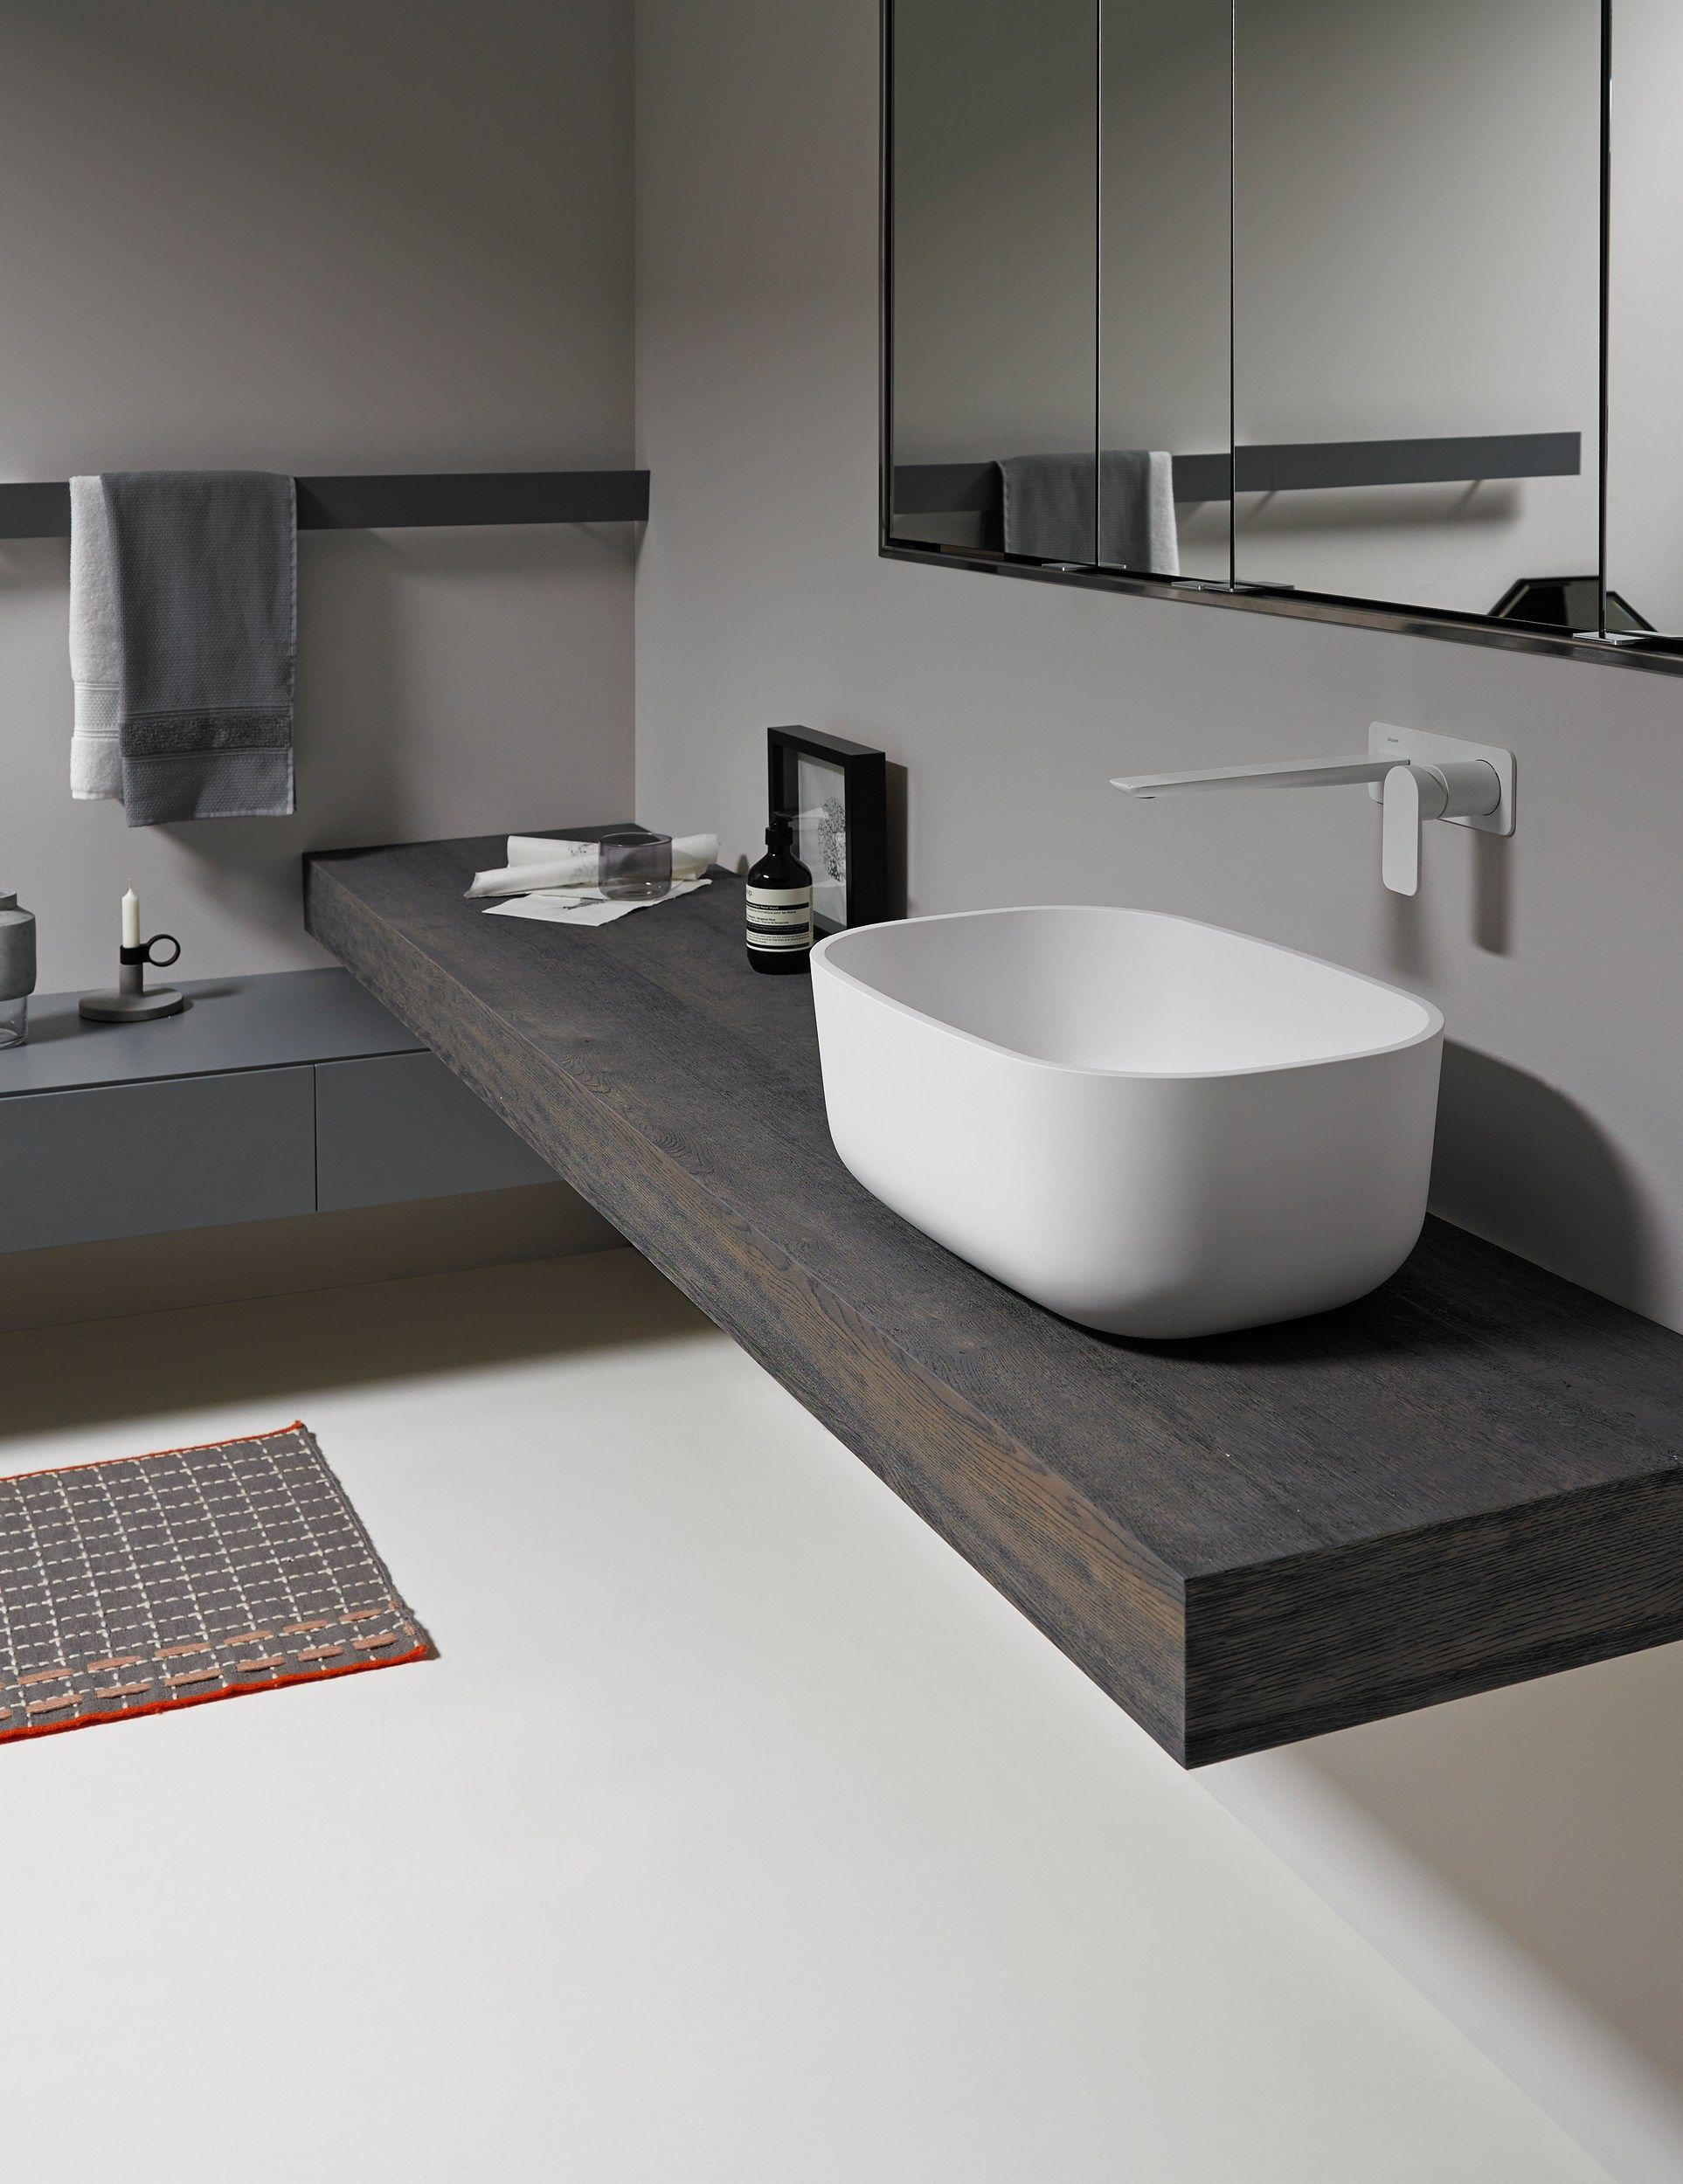 Arredo bagno completo STRATO 09 by INBANI Badezimmer